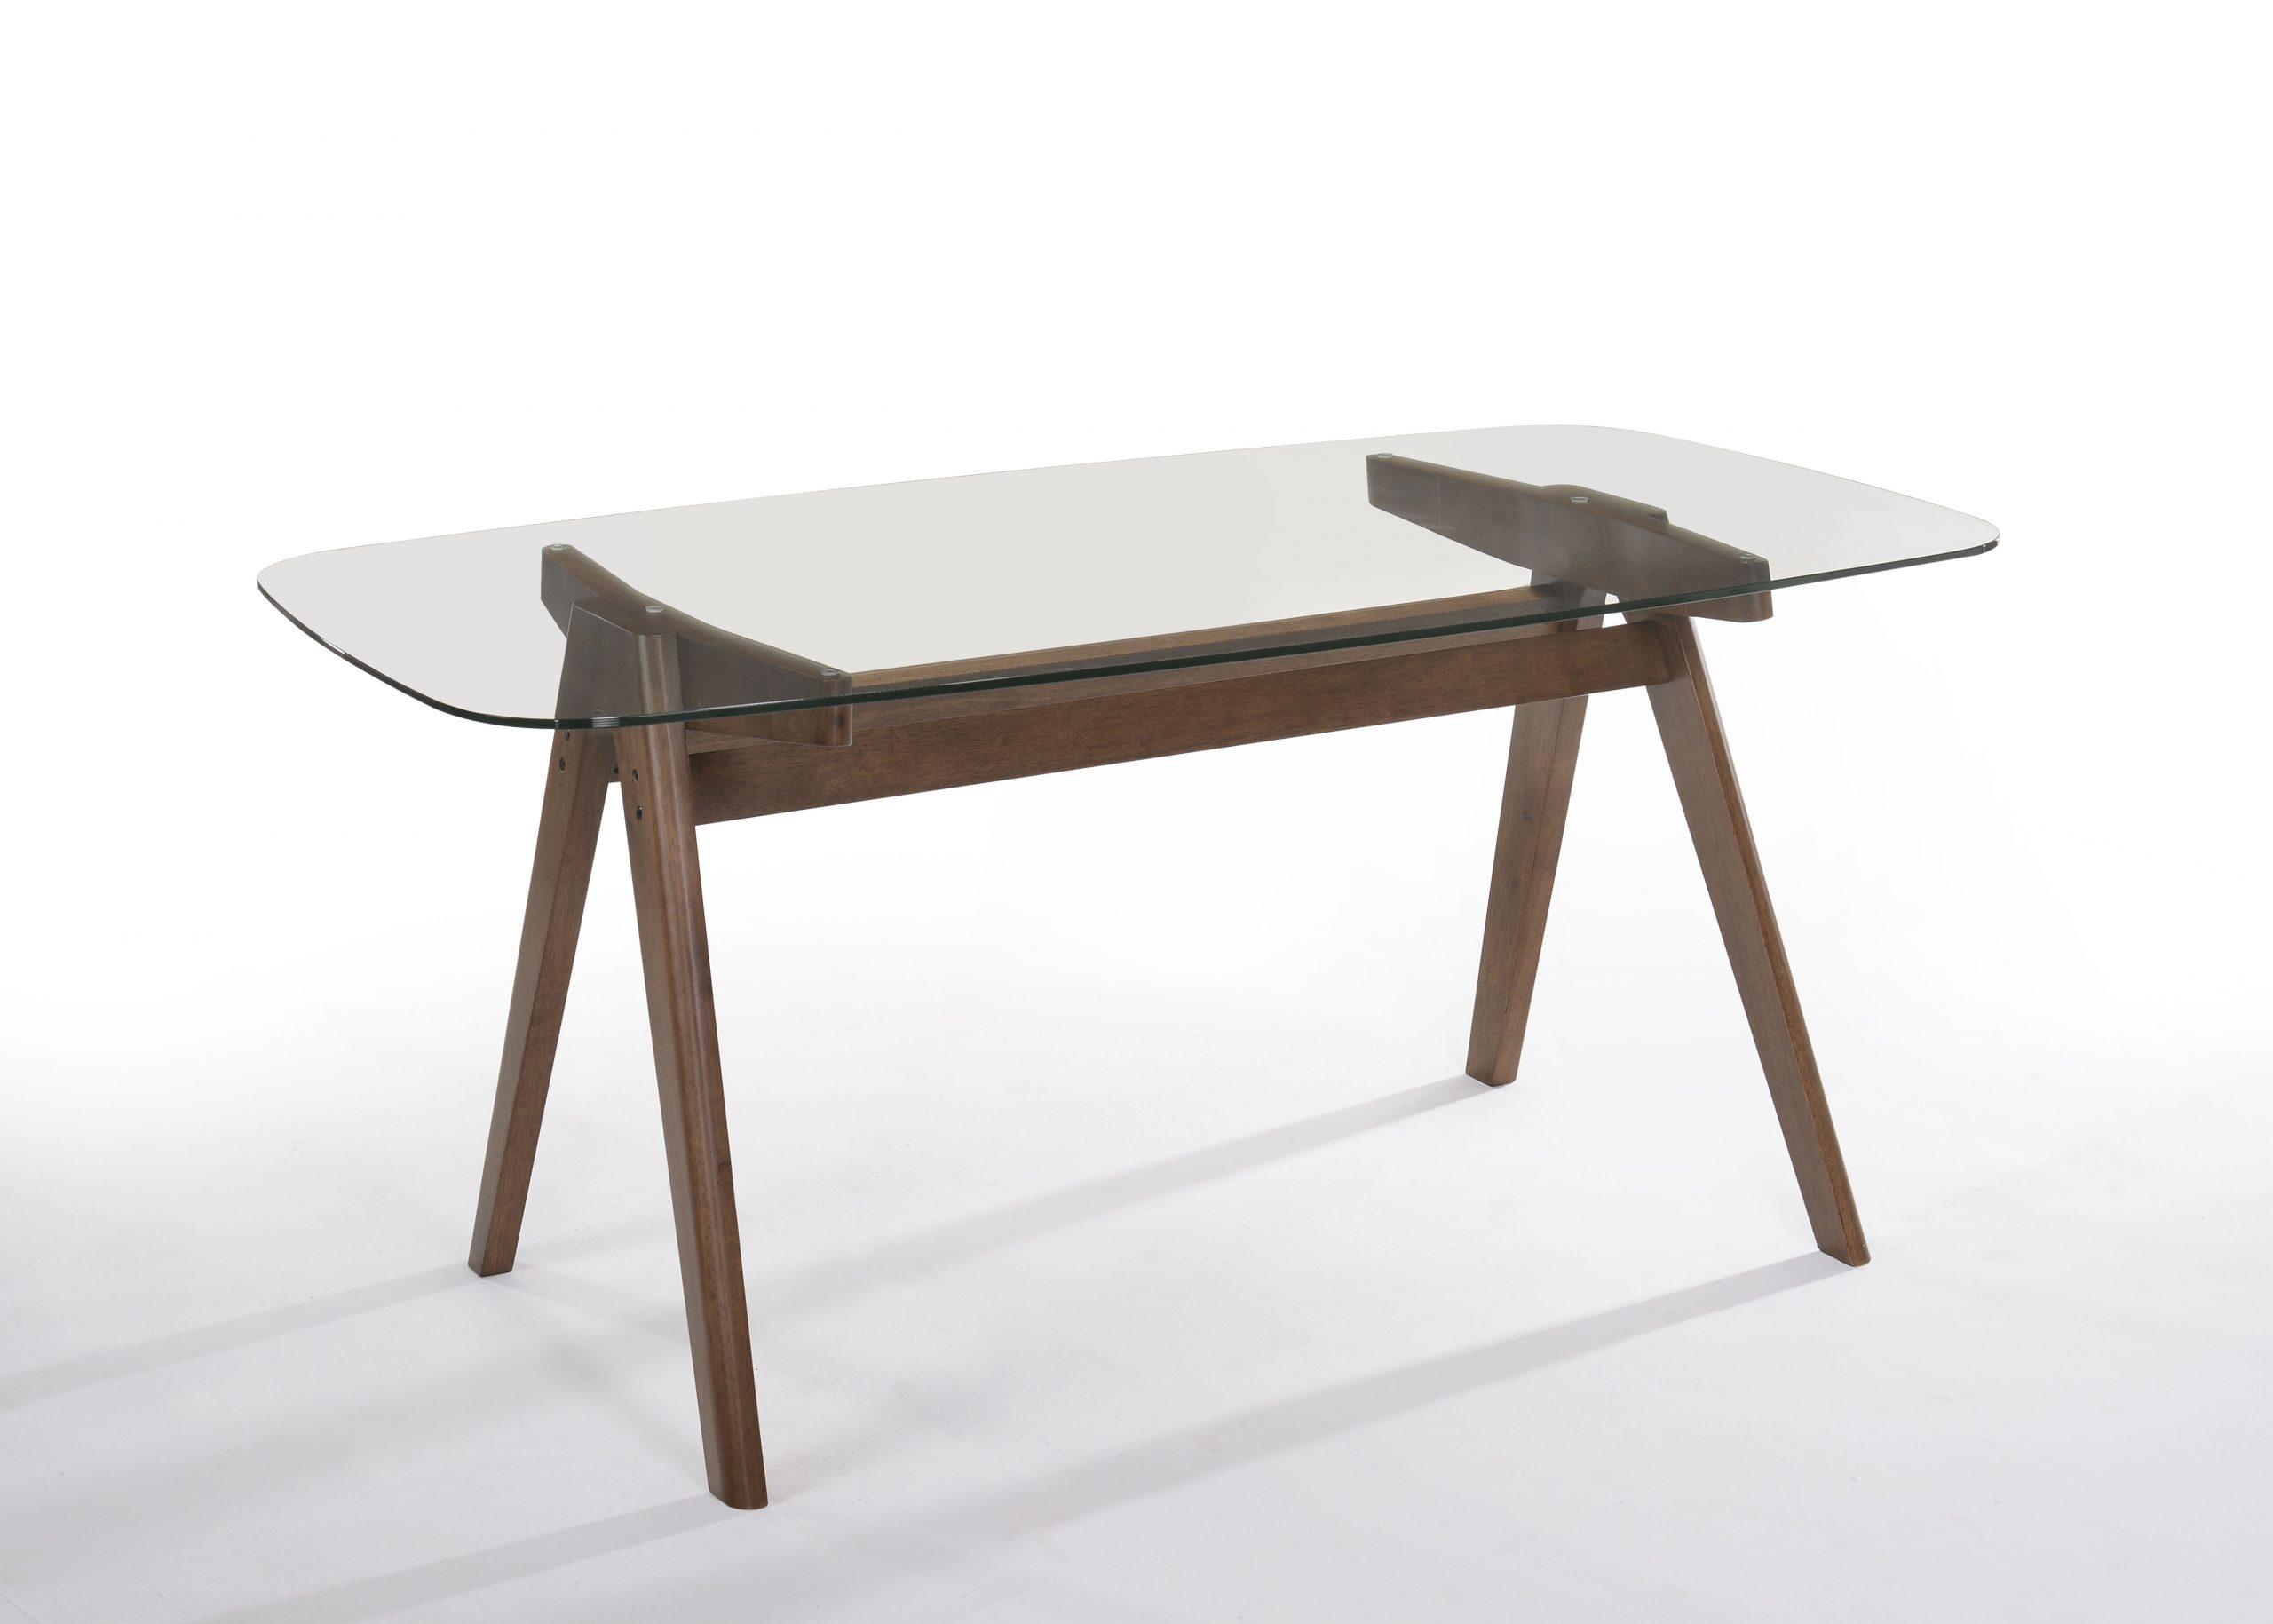 Mobiliya design - Masa -  MİT-5152  - 1